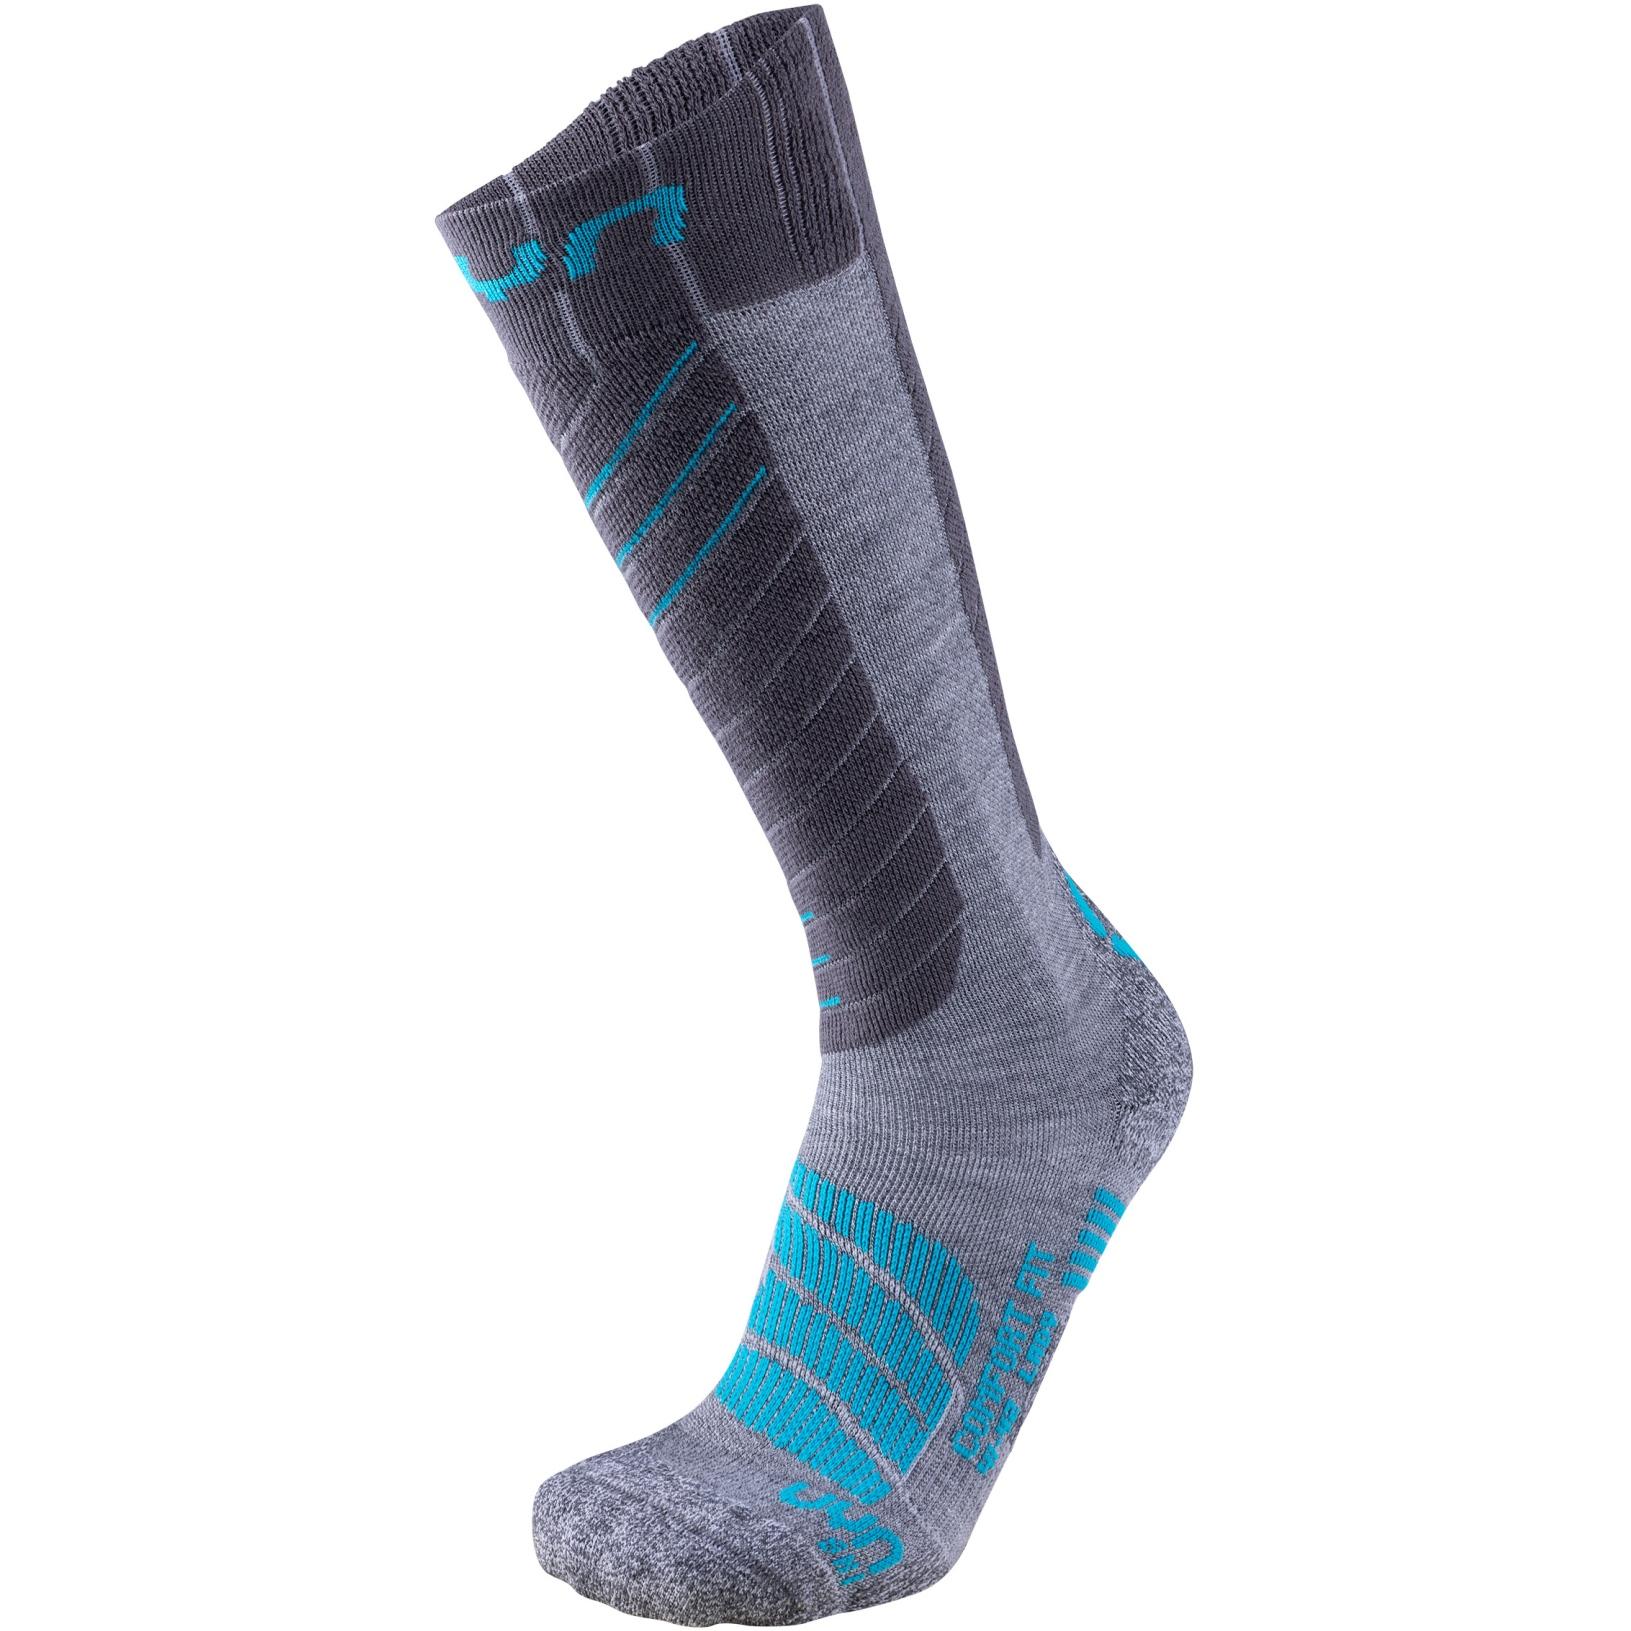 UYN Comfort Fit Ski Socks Women - Grey/Turquoise